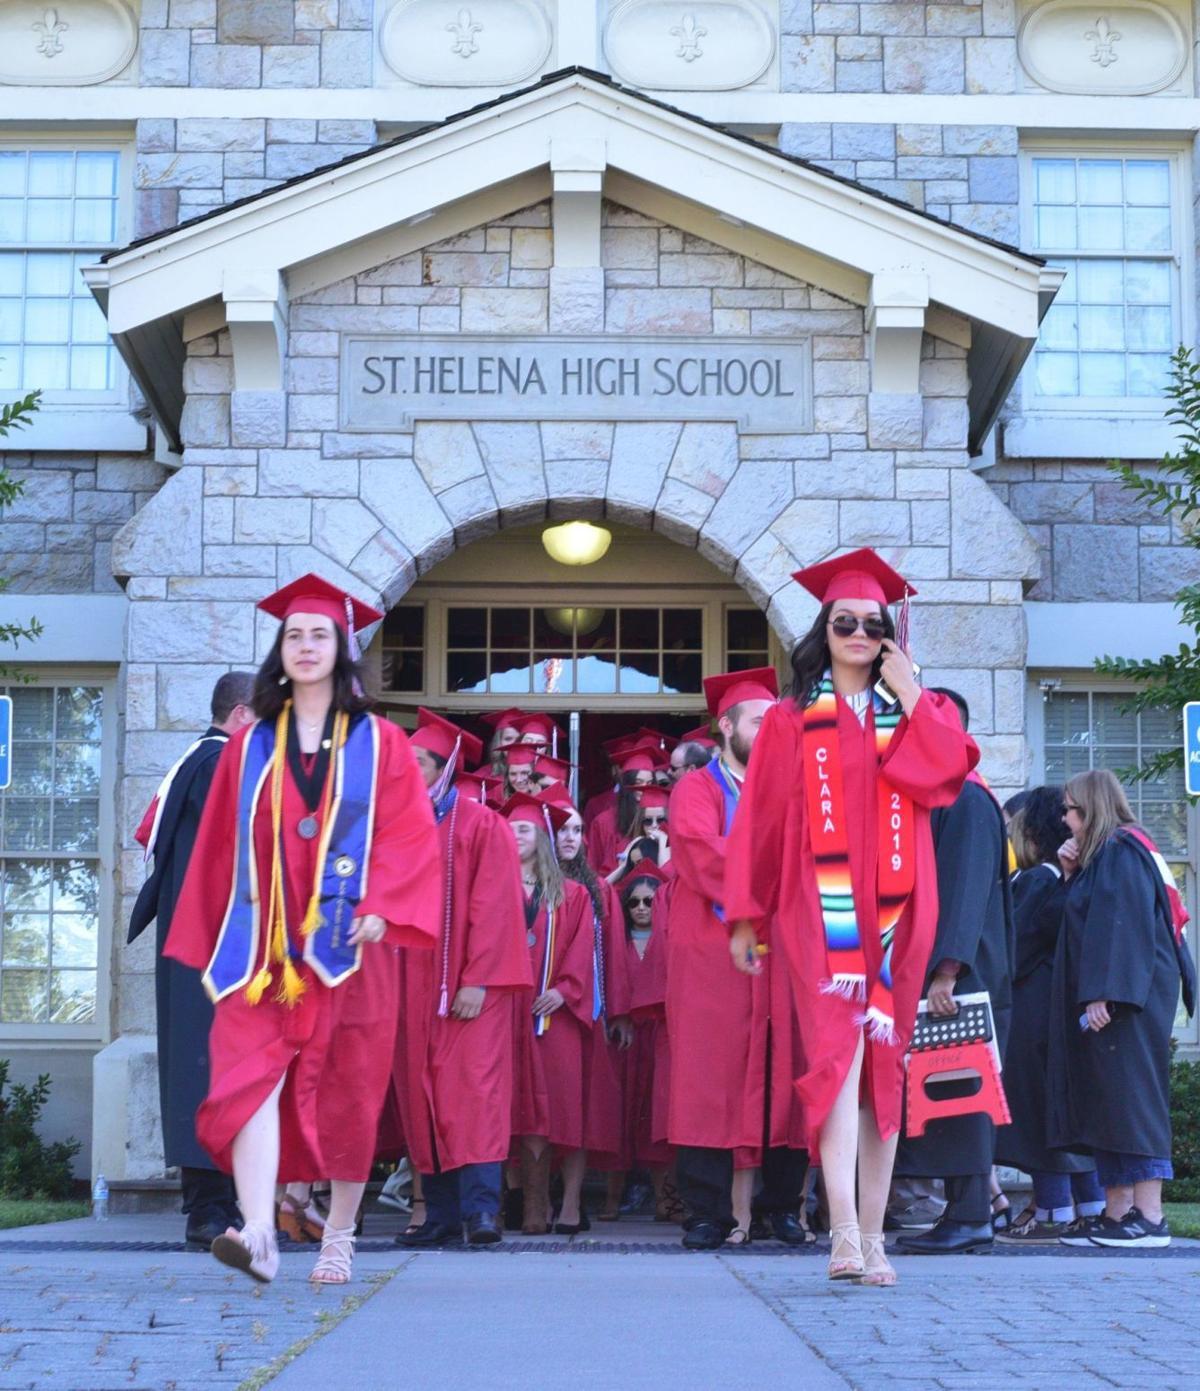 St. Helena Graduates march